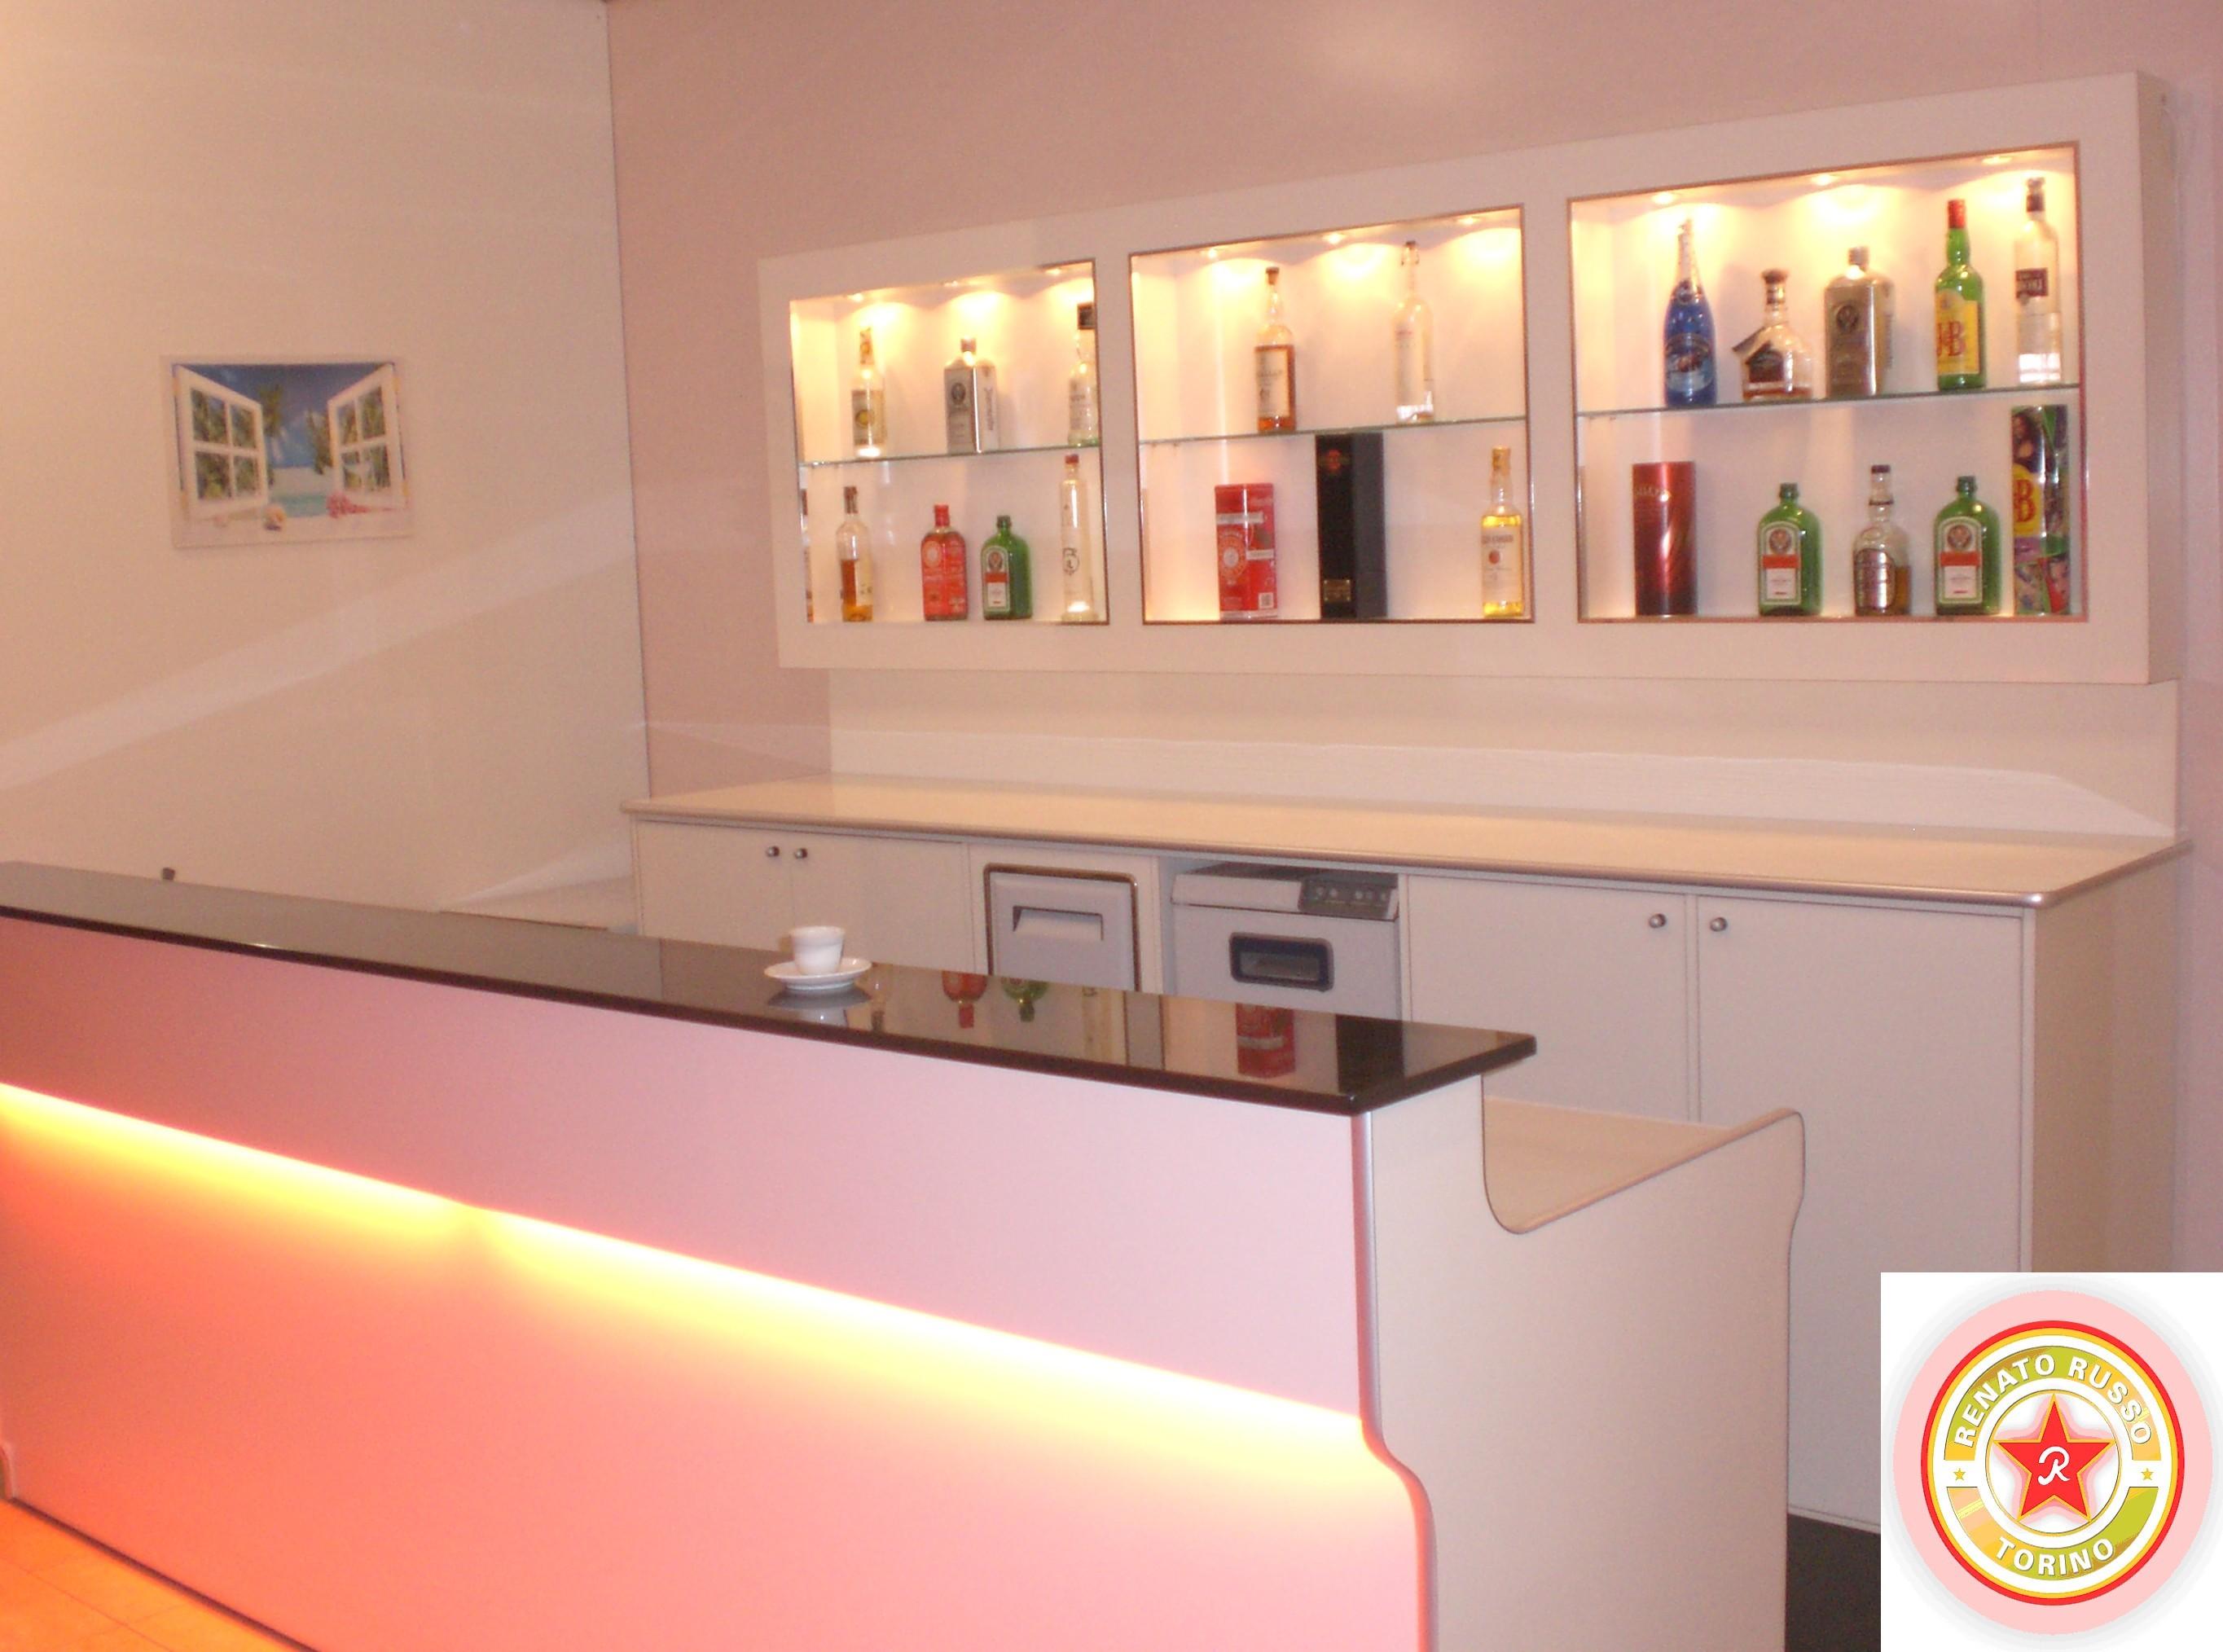 Banconi bar milano compra in fabbrica banchi bar for Banconi bar usati prezzi